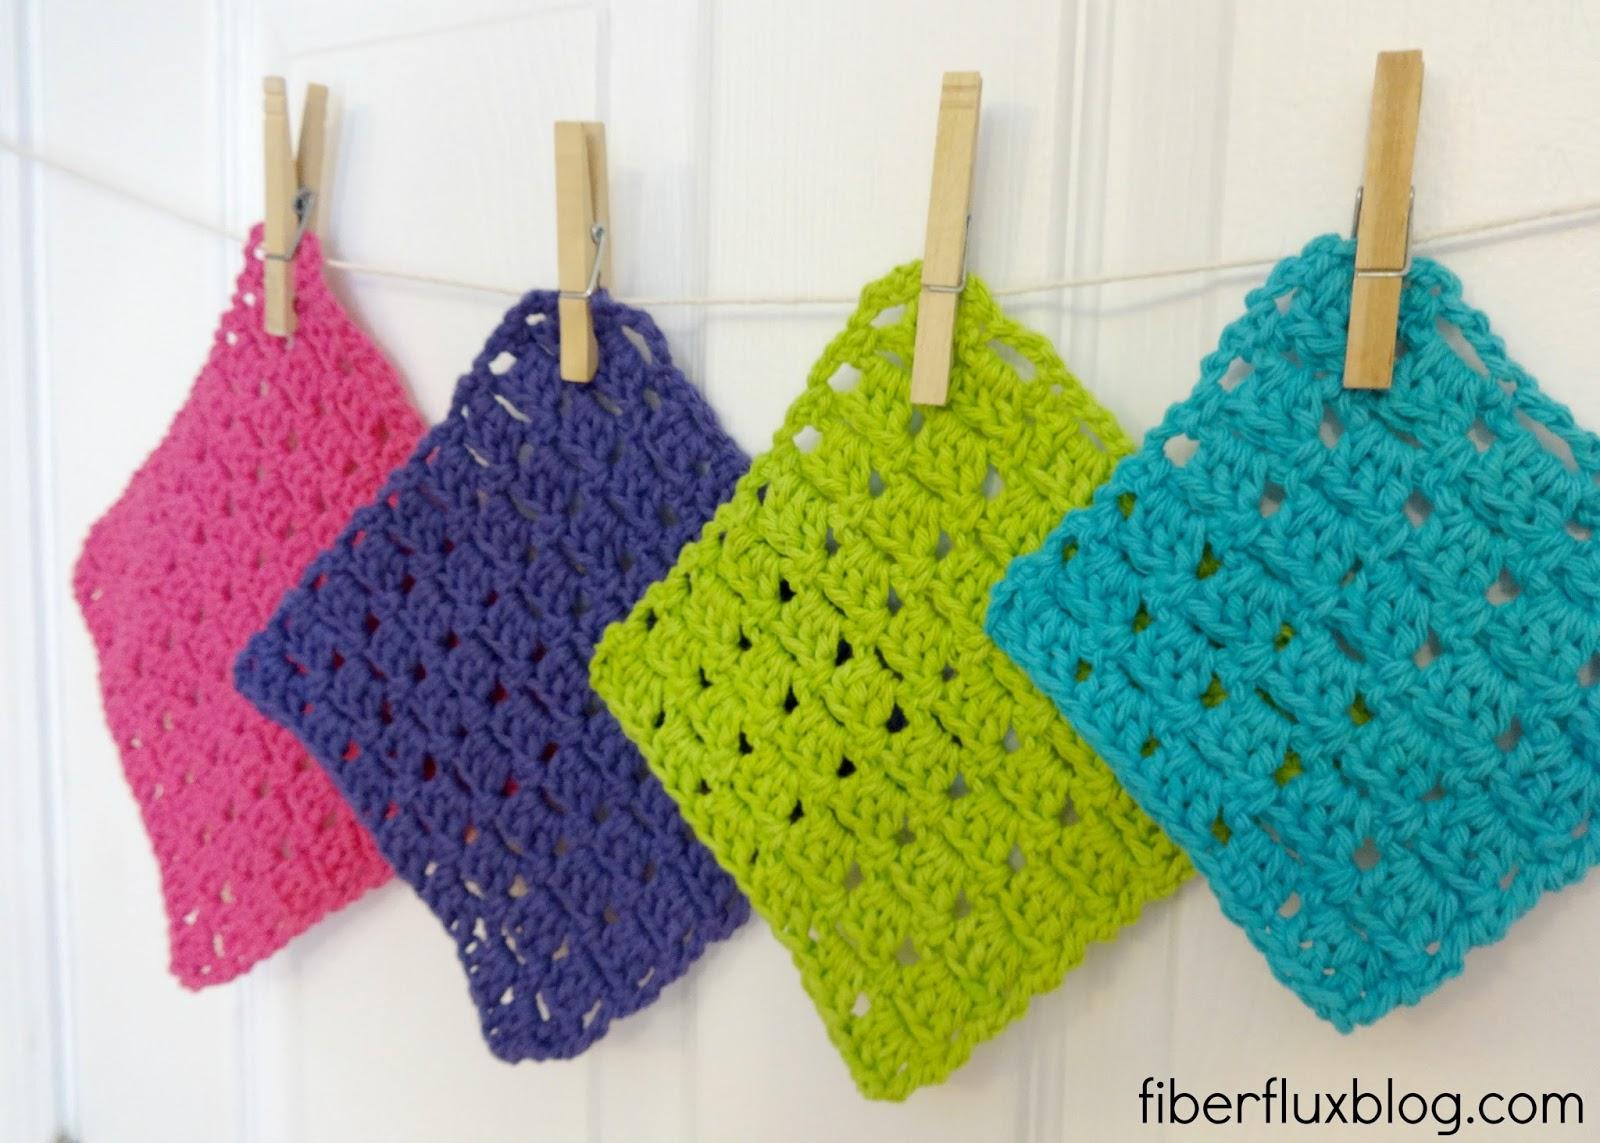 Fiber flux free crochet patternsparkling clean dishcloths free crochet patternsparkling clean dishcloths bankloansurffo Choice Image